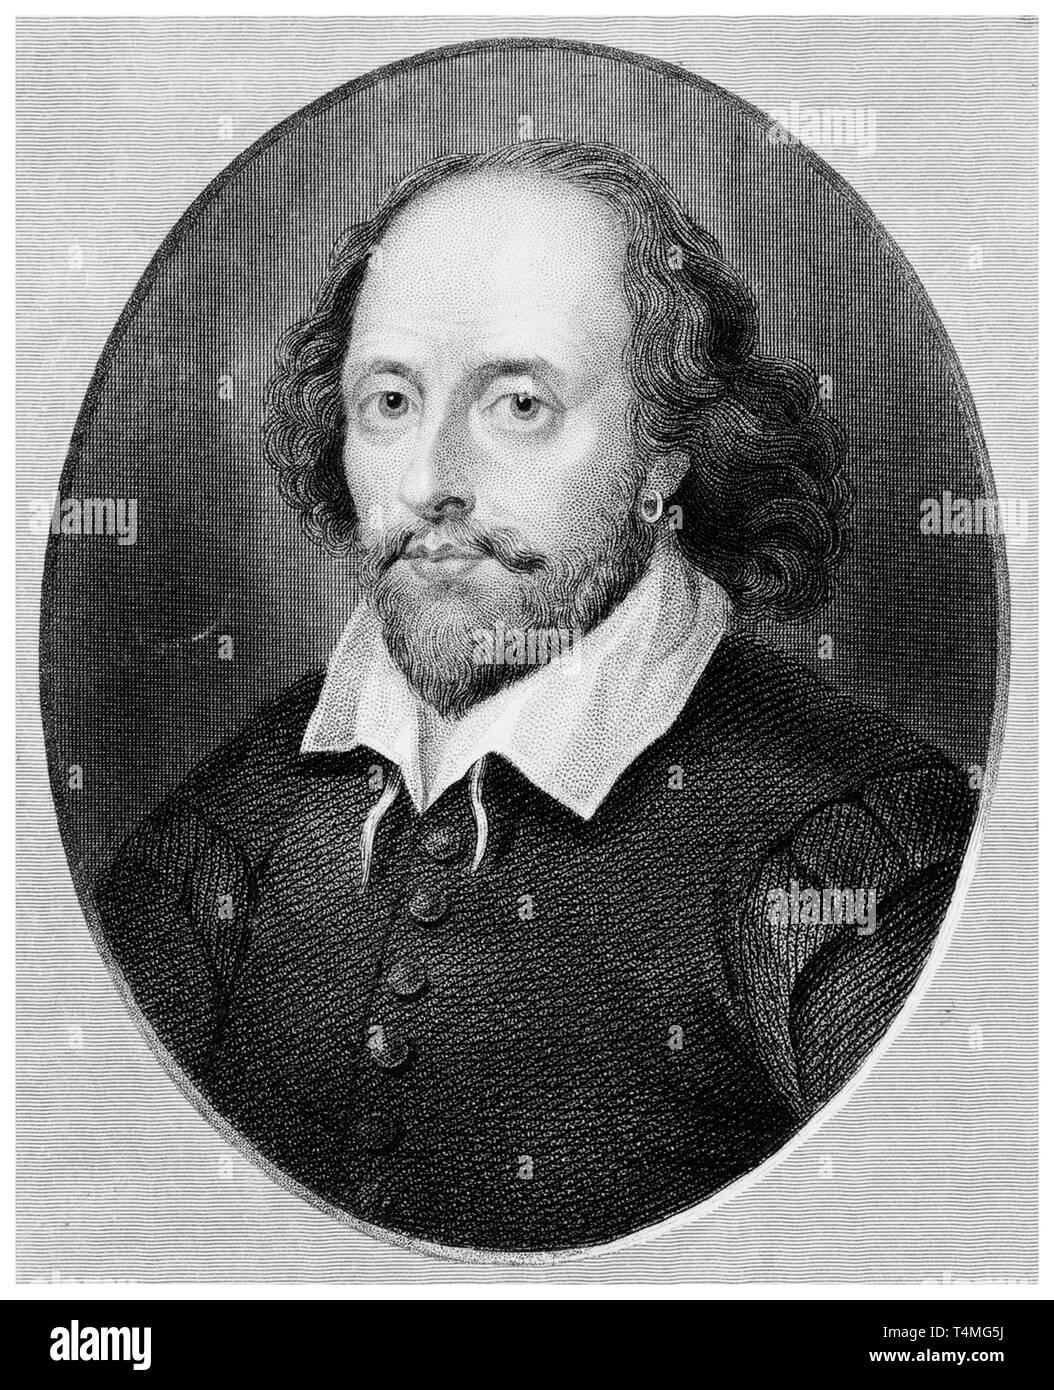 William Shakespeare (1564-1616), portrait engraving, Benjamin Holl, 19th Century after Arnold Houbraken Stock Photo